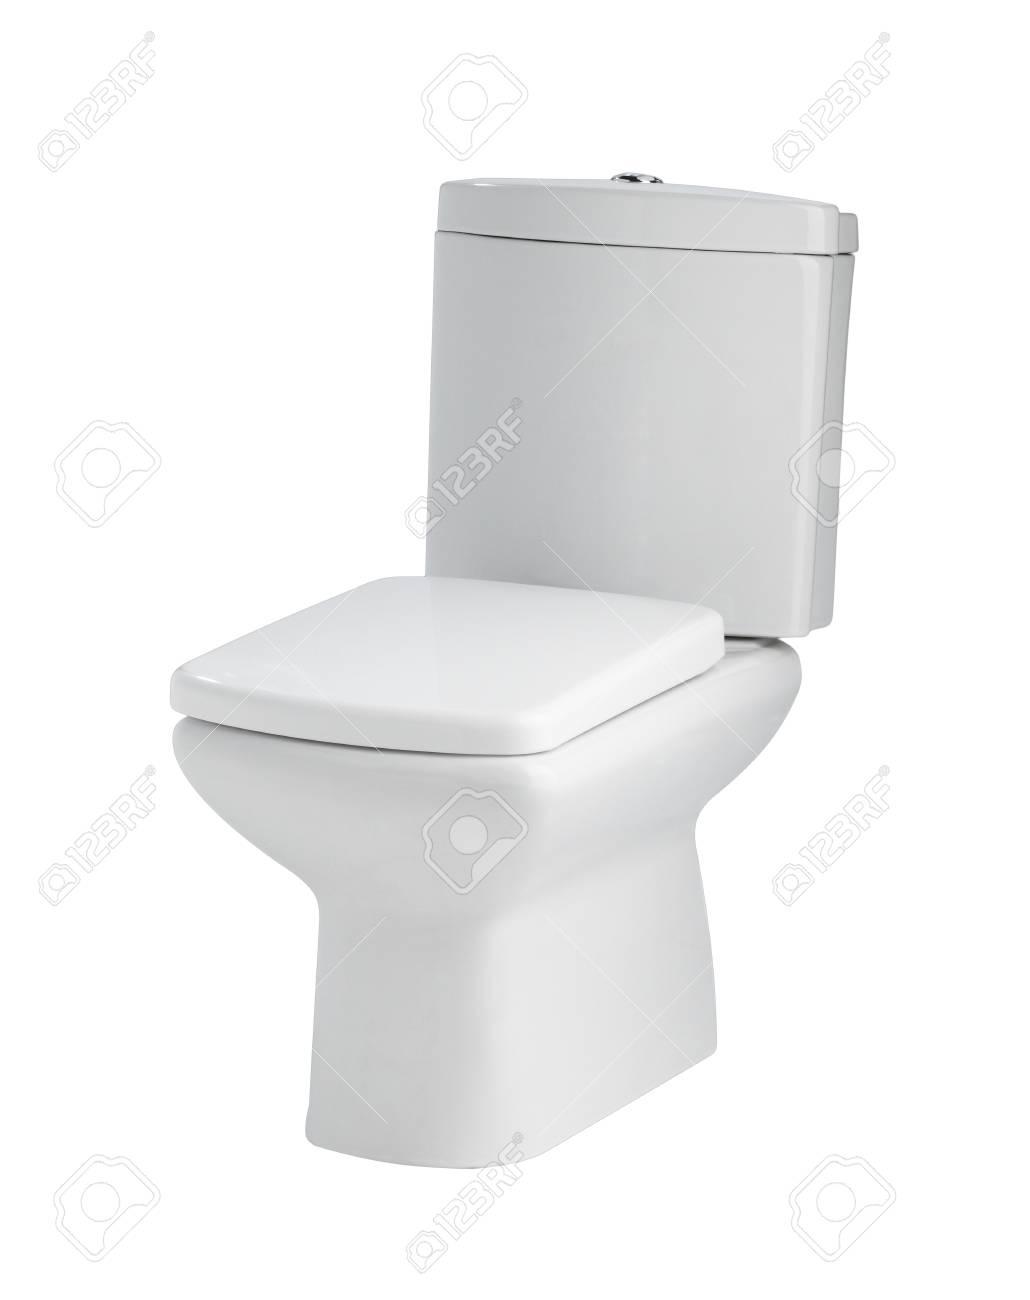 Nice And Beautiful Design Ceramic Toilet Bowl Stock Photo